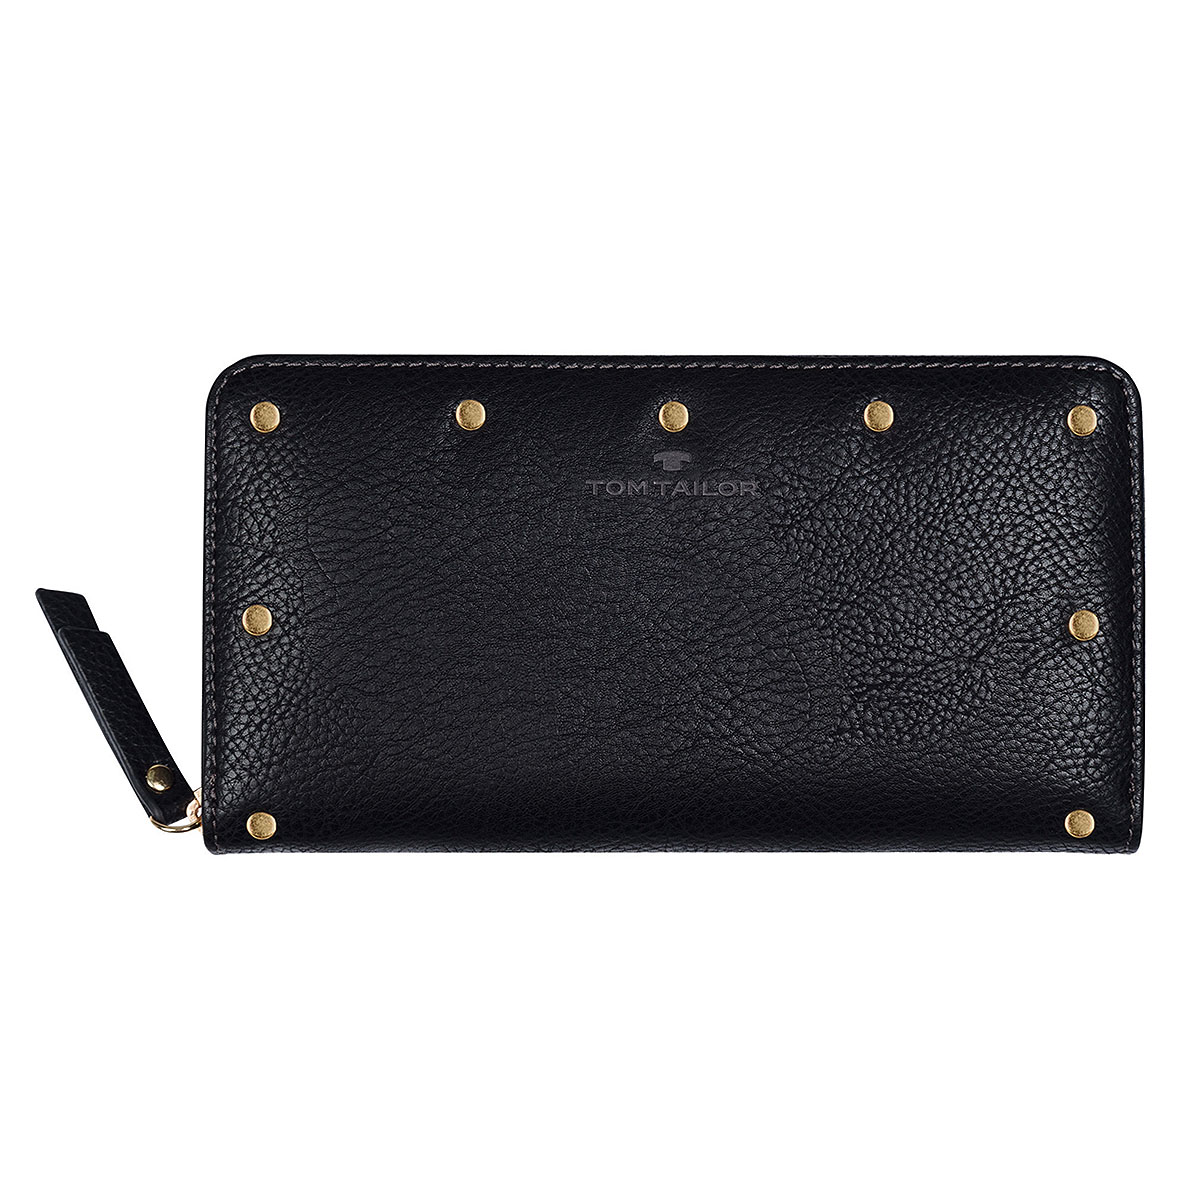 4a67c33d9cf833 Tom Tailor Mary Reißverschluss Geldbörse Portemonnaie 24013 ...